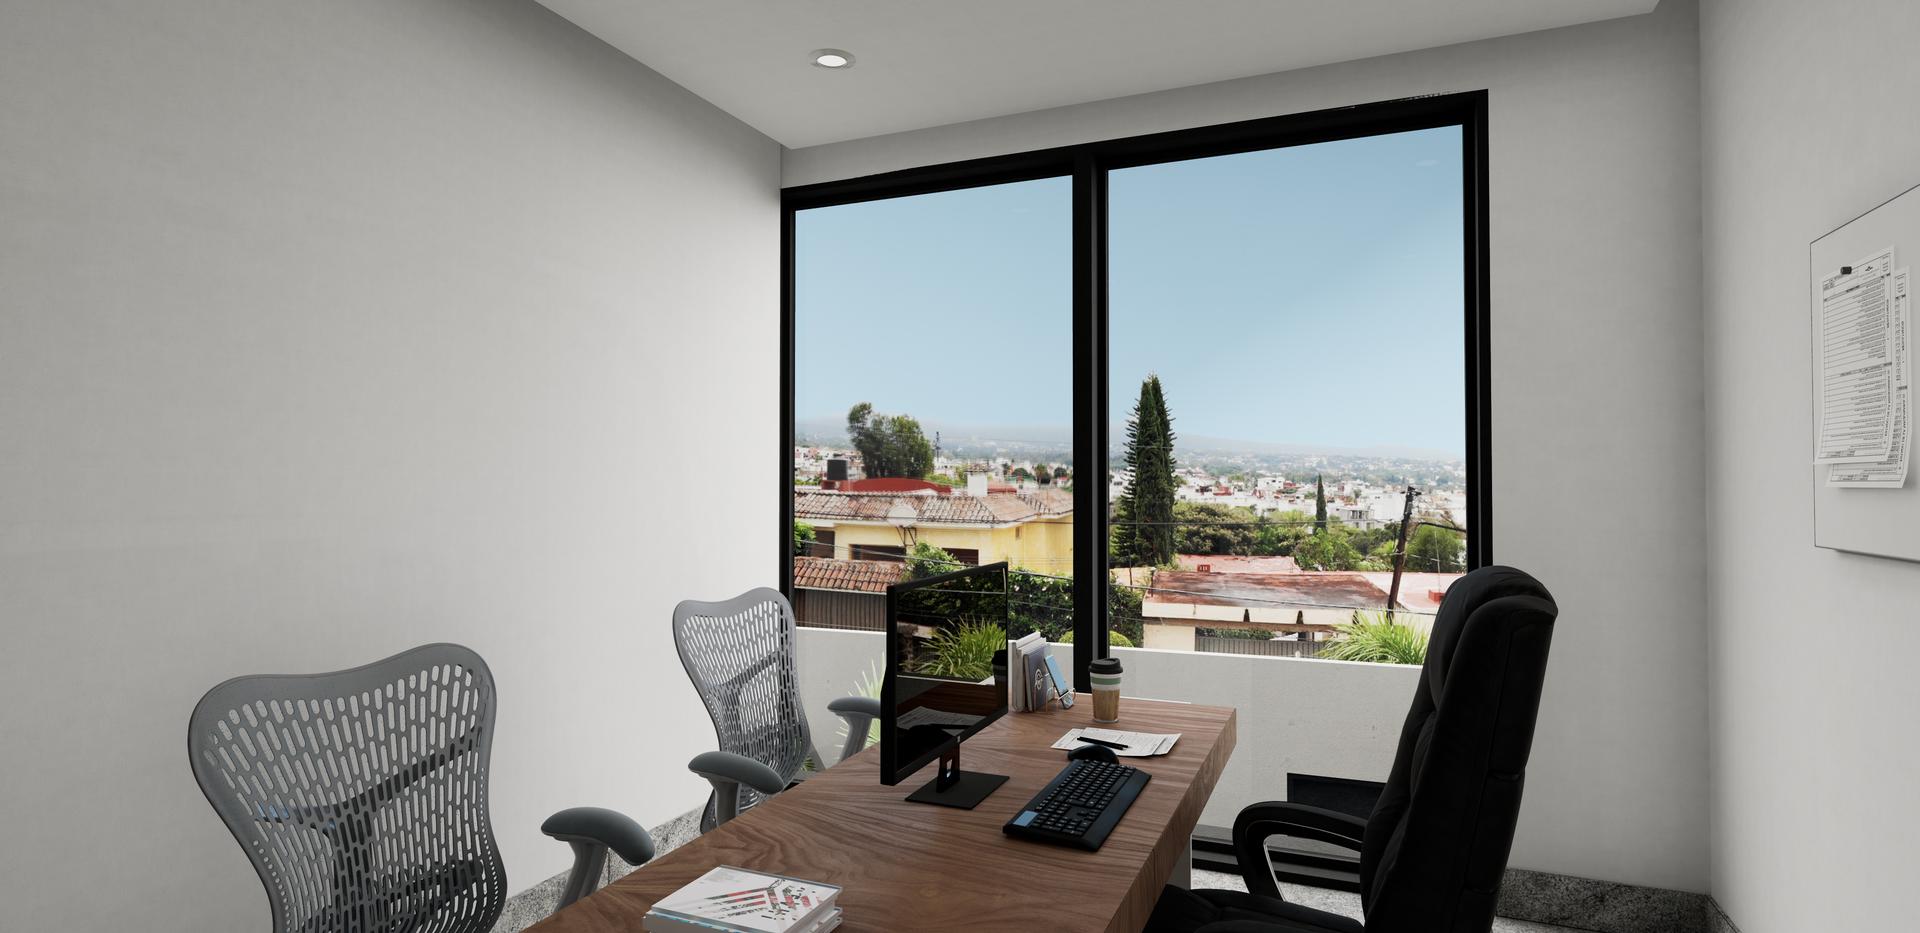 UR-DM Arquitectos Oficinas-Render 17.png